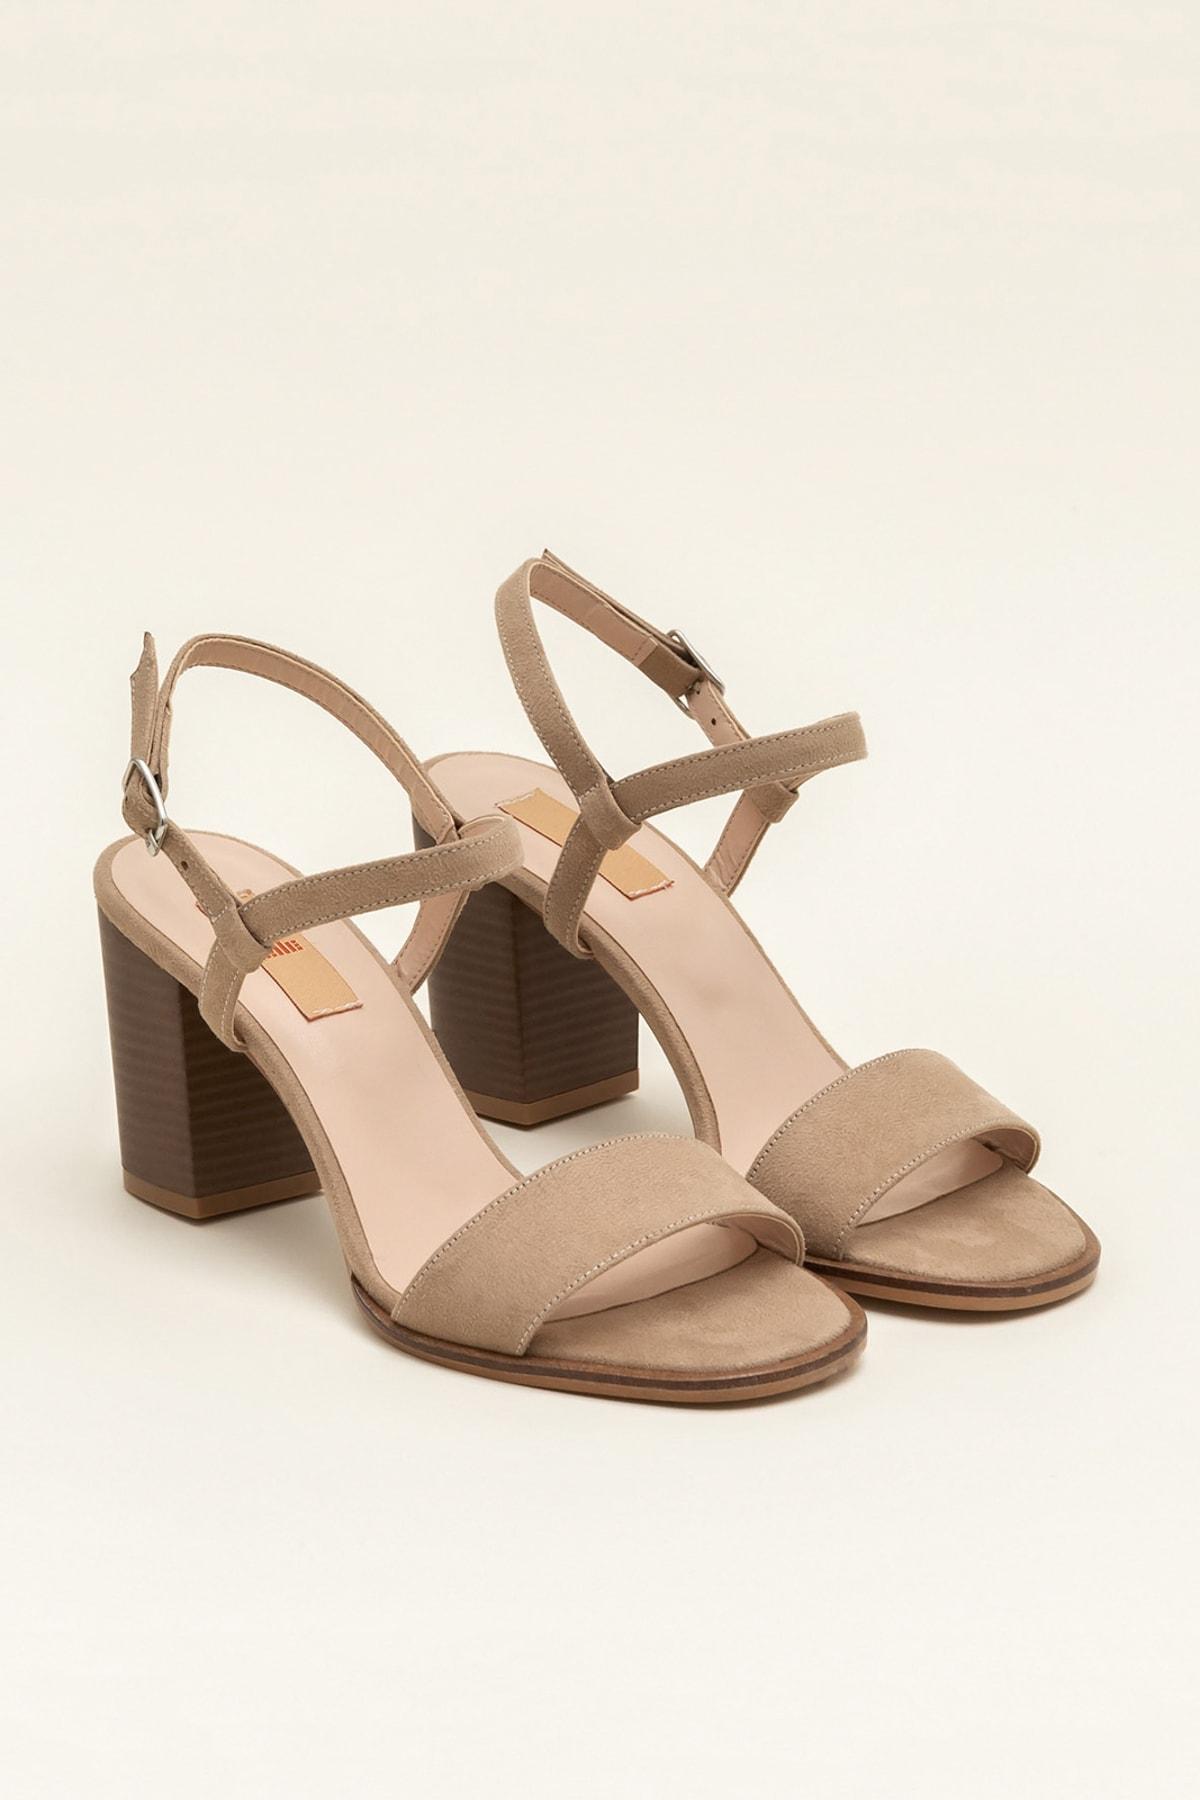 Elle Shoes GUSTINEE Bej Kadın Sandalet 2